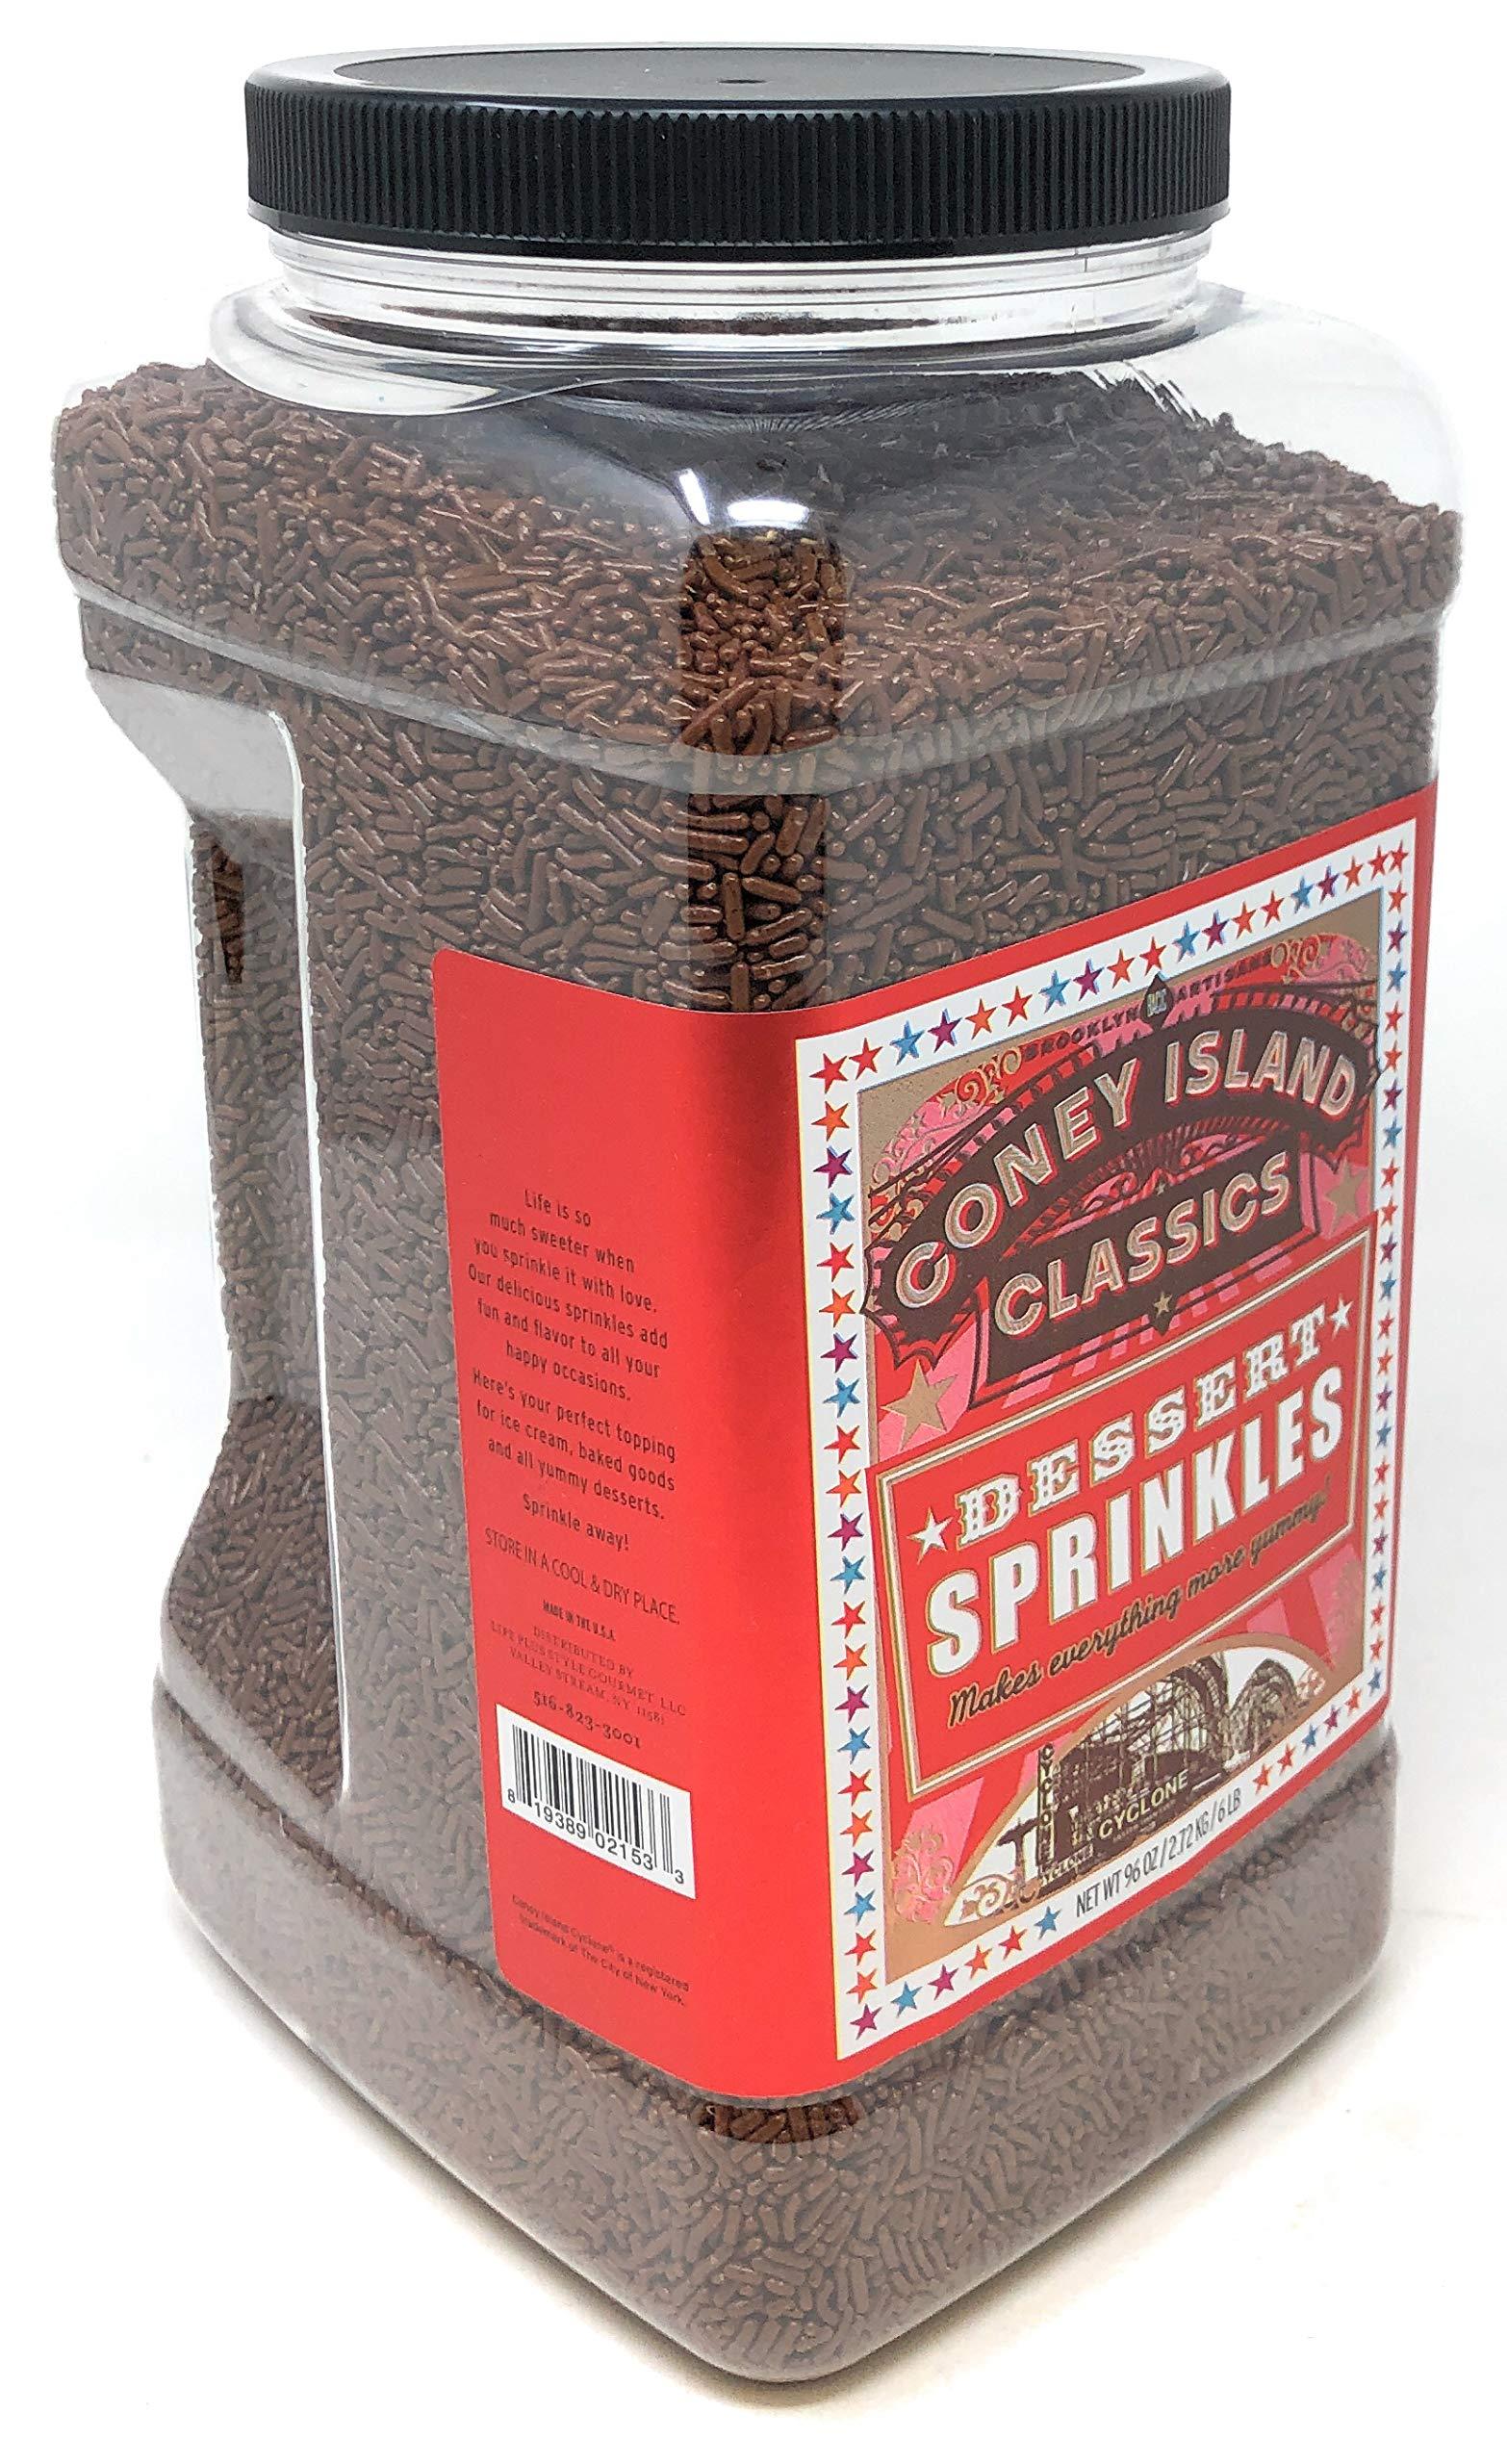 Brooklyn Artisans Premium Gourmet Decorative Dessert Chocolate Sprinkles Jimmies Bulk Reusable Jar 6 Lbs (Made in USA) Kosher by CONEY ISLAND CLASSICS